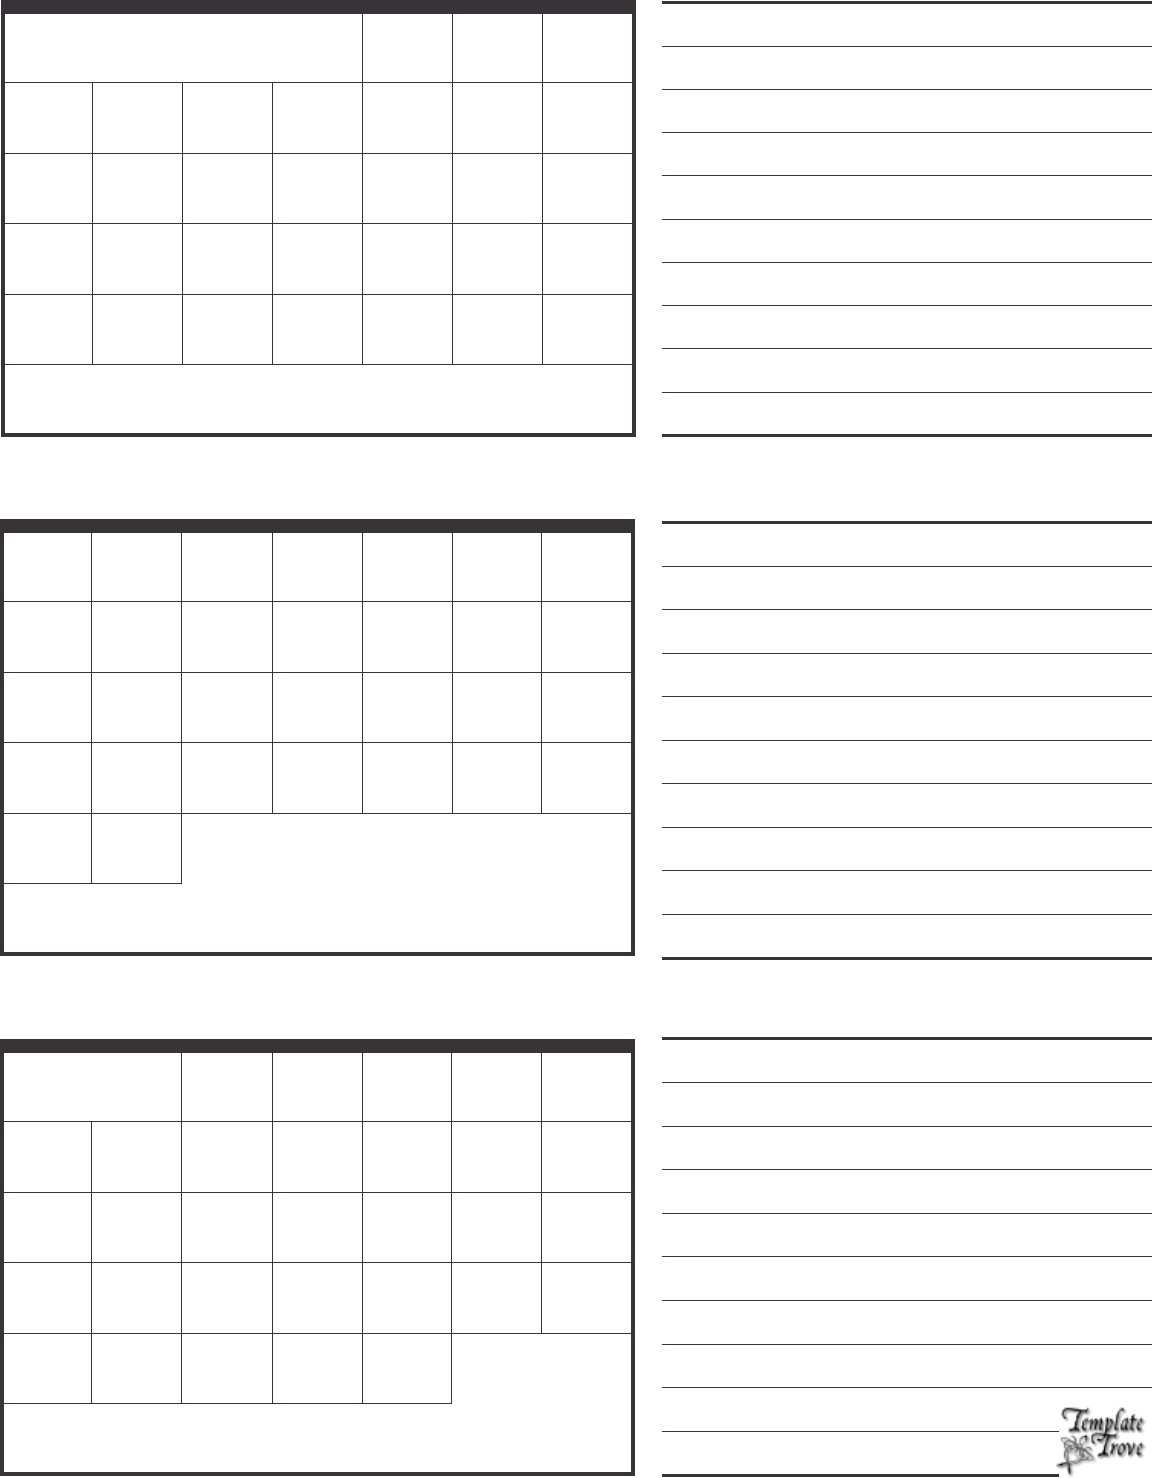 2015 calendar 3 months per page